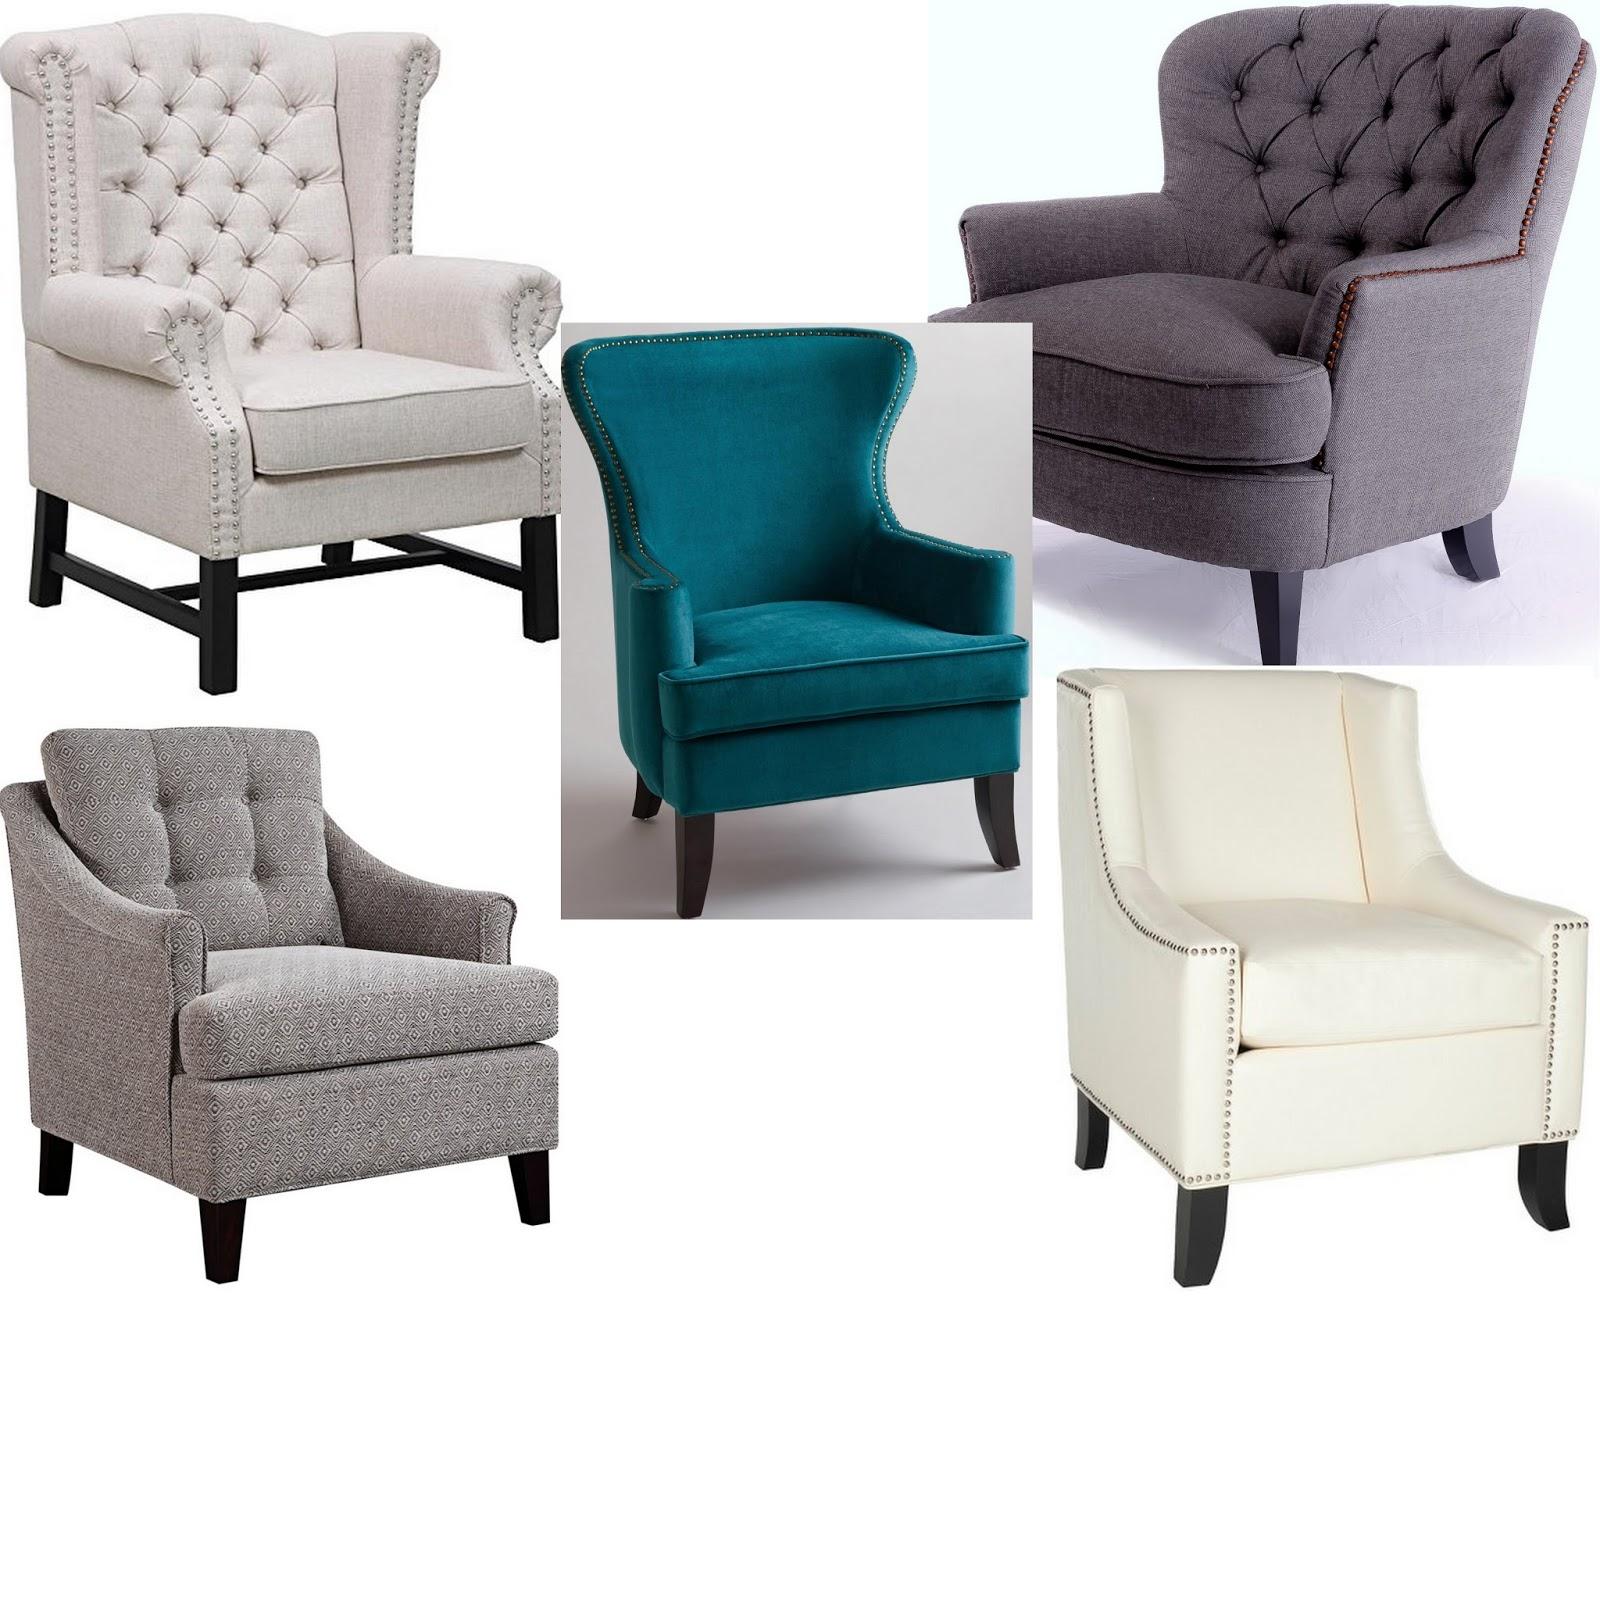 Studio 7 Interior Design The Friday Five Club Chairs